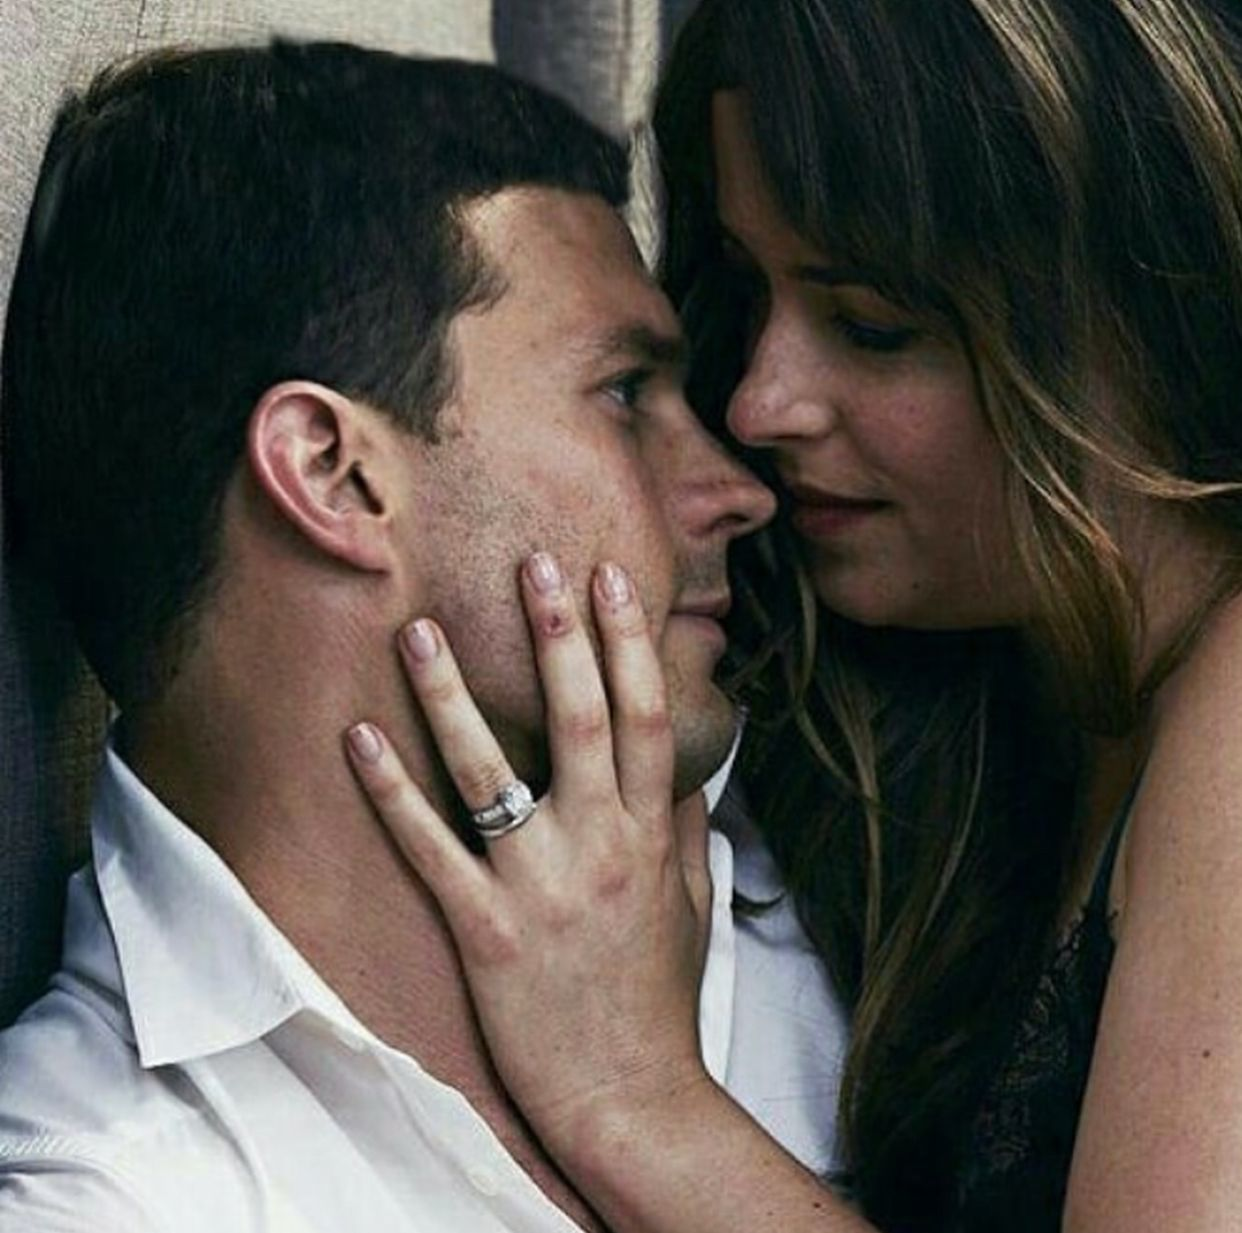 JD❤️DJ ✨ Christian & Anastasia ✨ #fiftyshadesfreed  ❤️❤️ #christiangrey #anastasiasteele #jamiedornan  #dakotajohnson #comingsoon #new